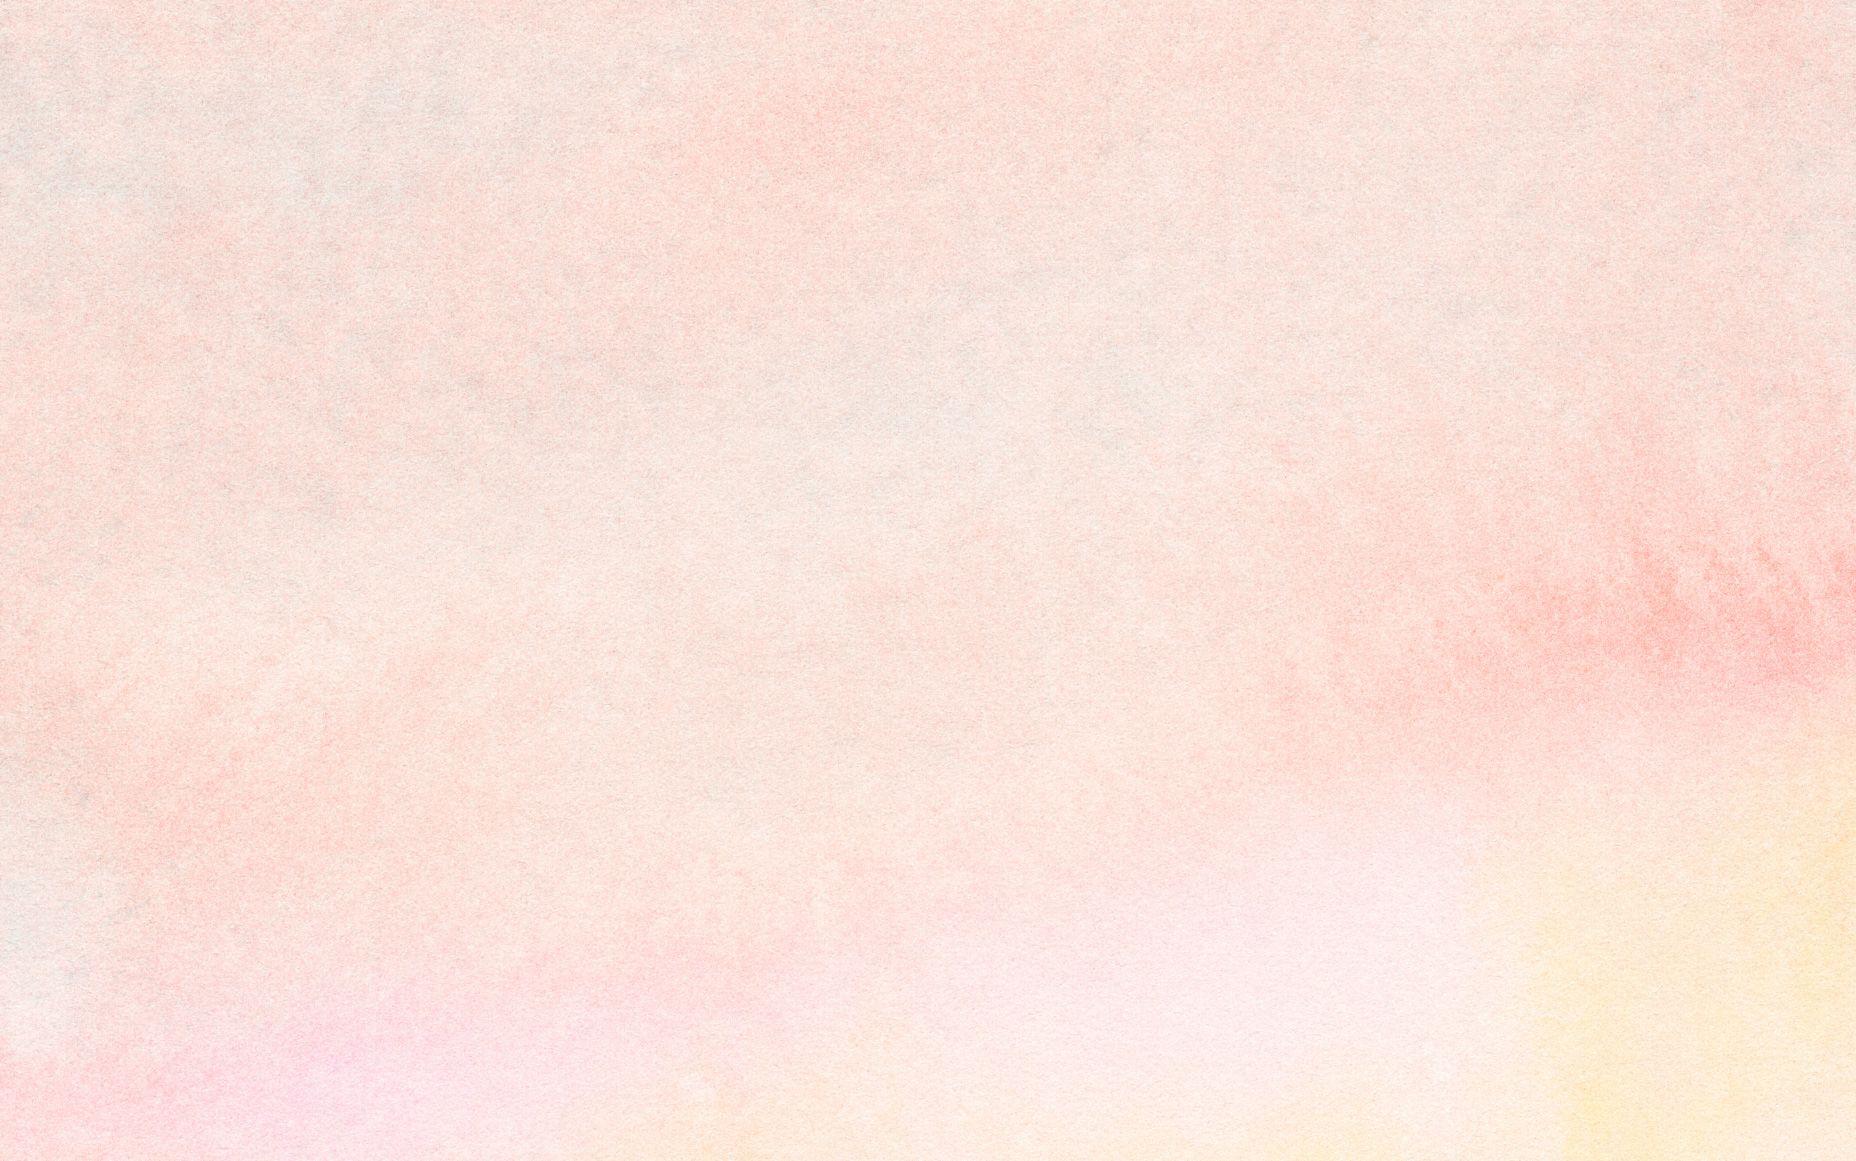 Coral Peach Blush Yellow Ombre Texture Desktop Wallpaper -6751